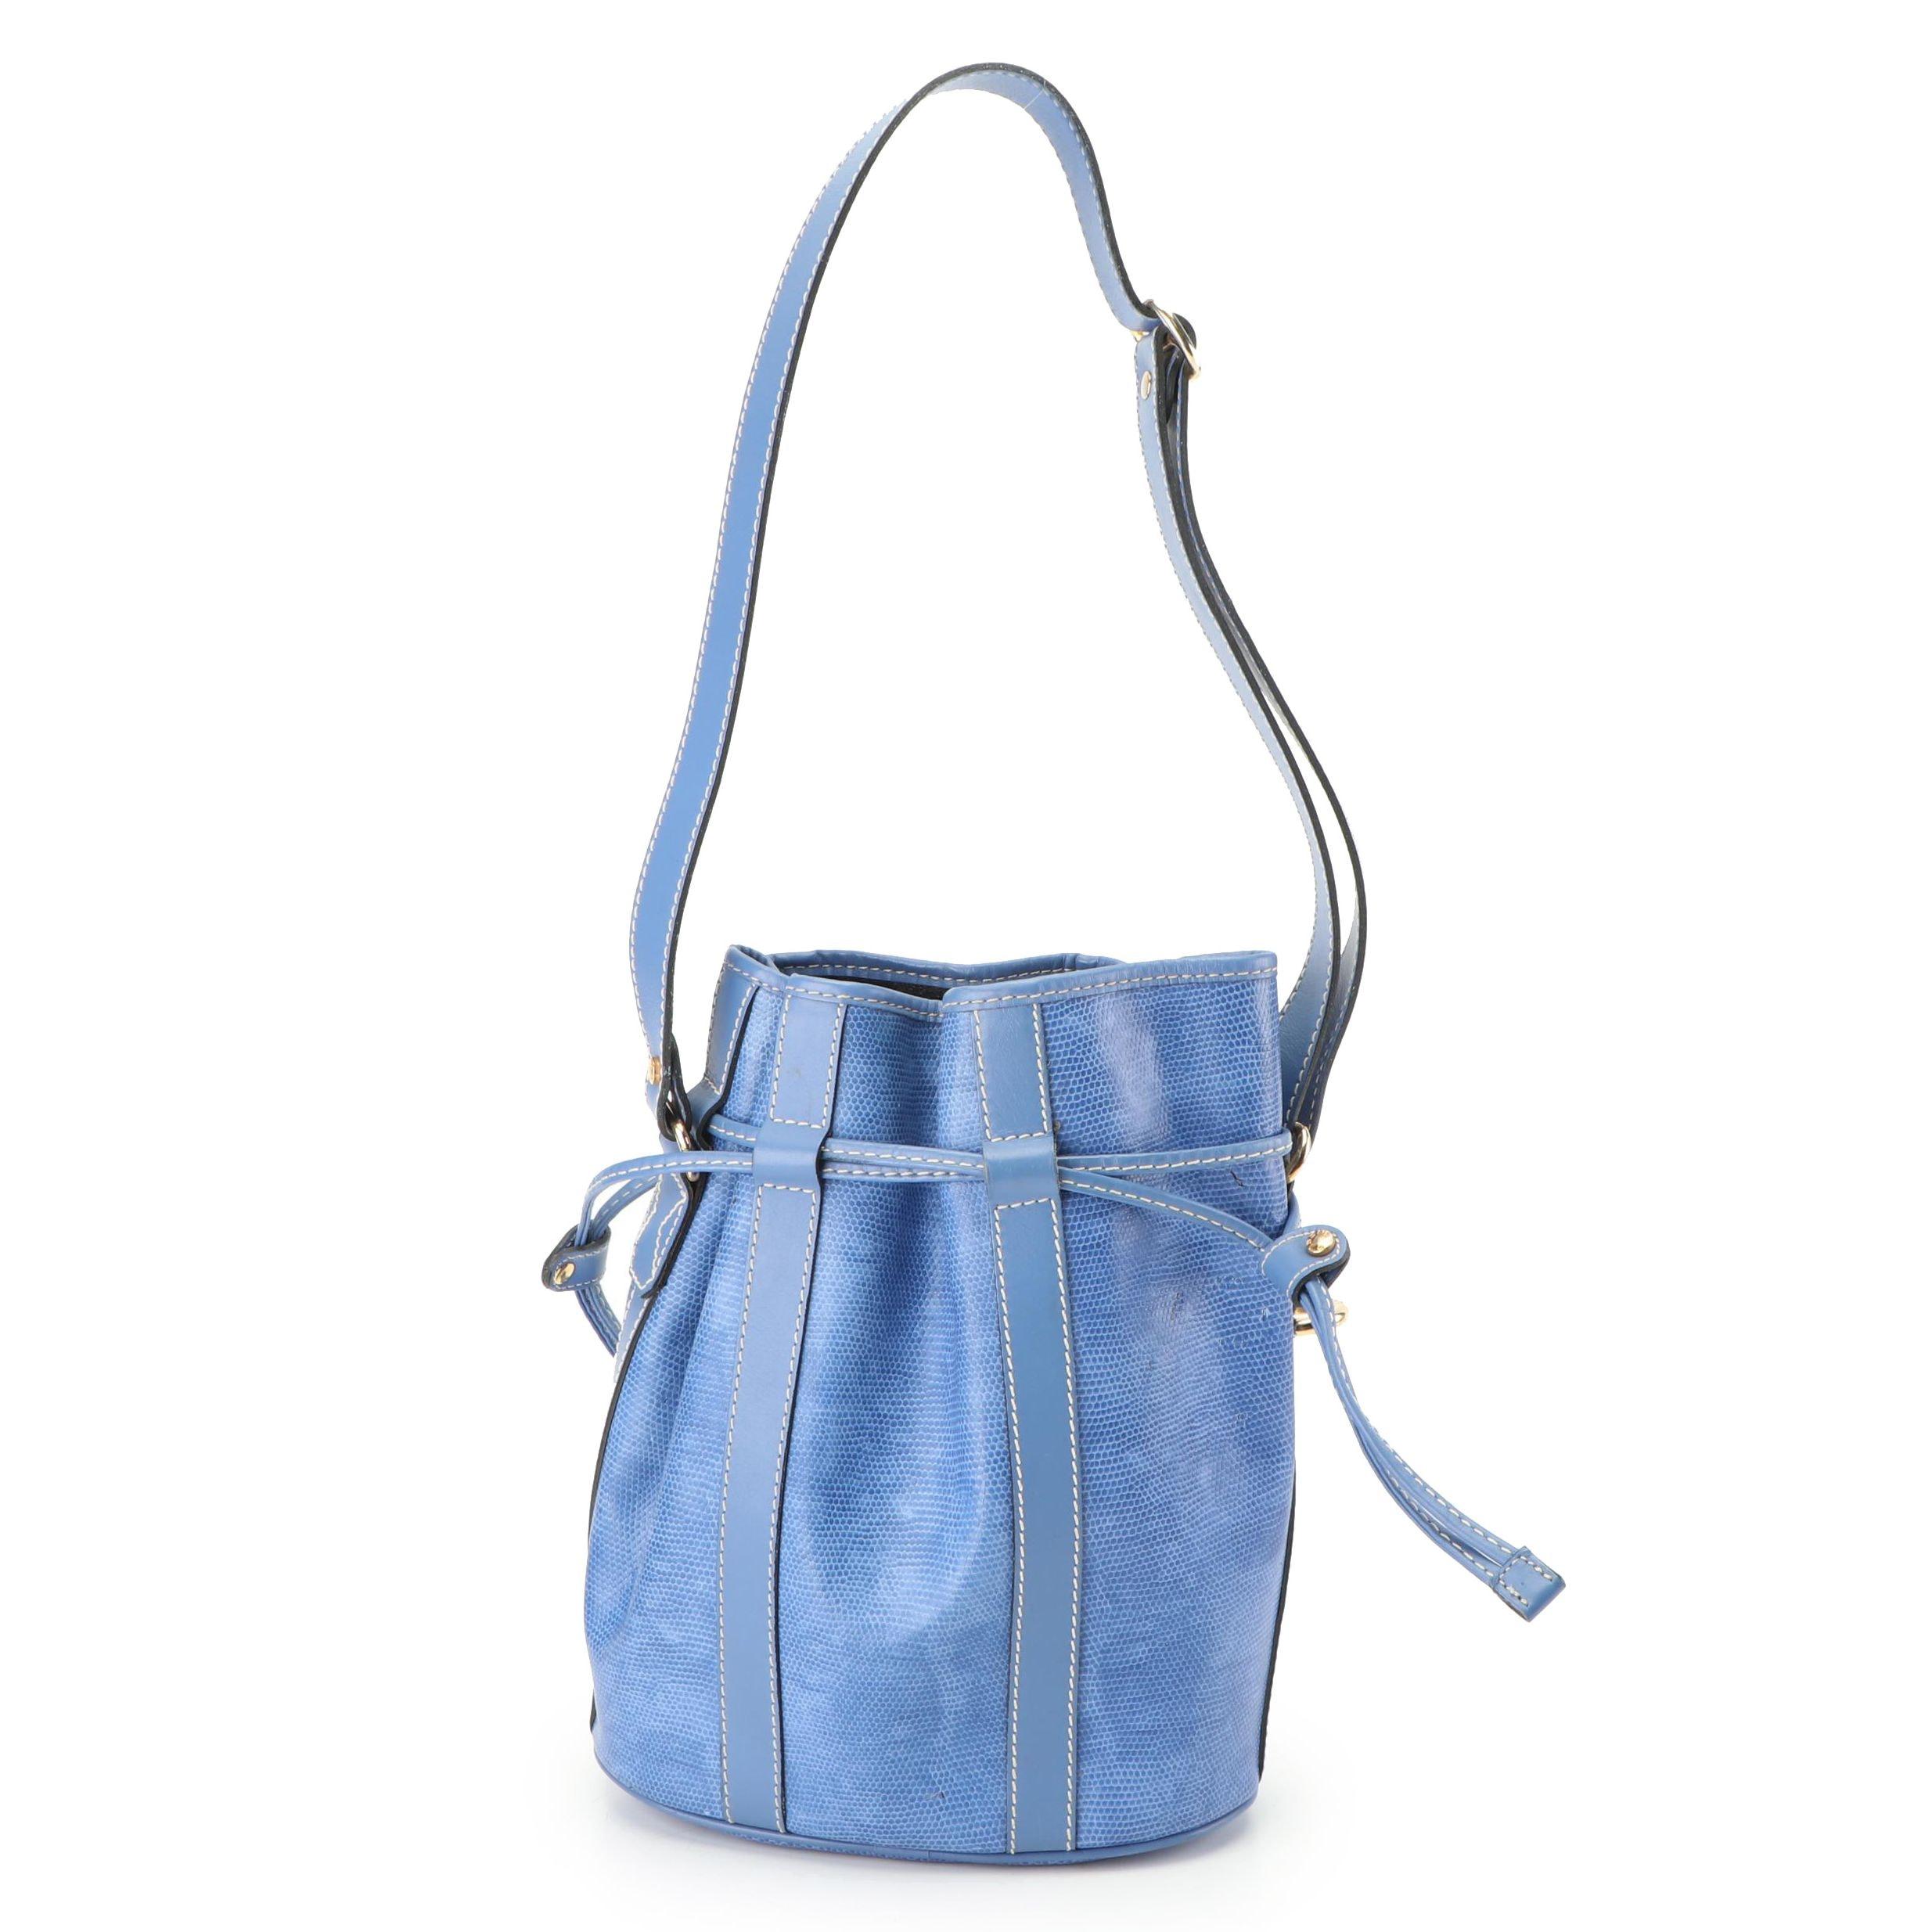 Lancel Lizard Embossed Blue Leather Bucket Bag